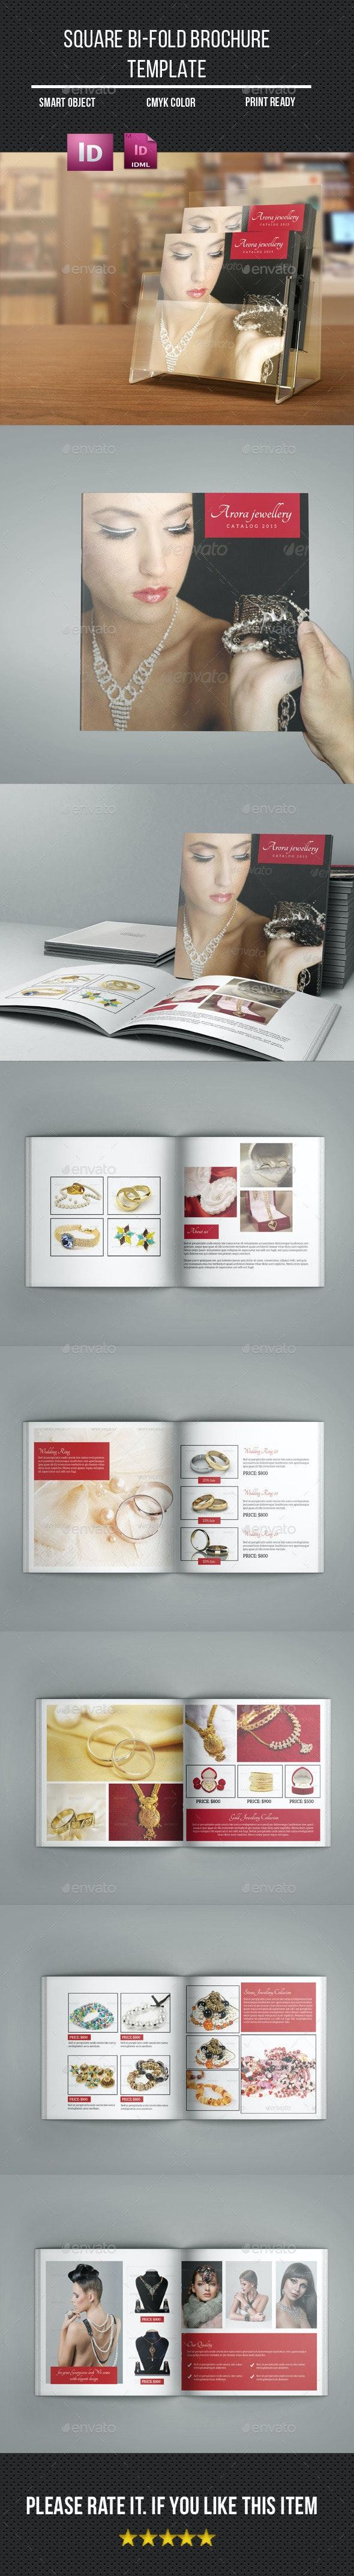 Square Bi- Fold Jewelry Brochure - Catalogs Brochures